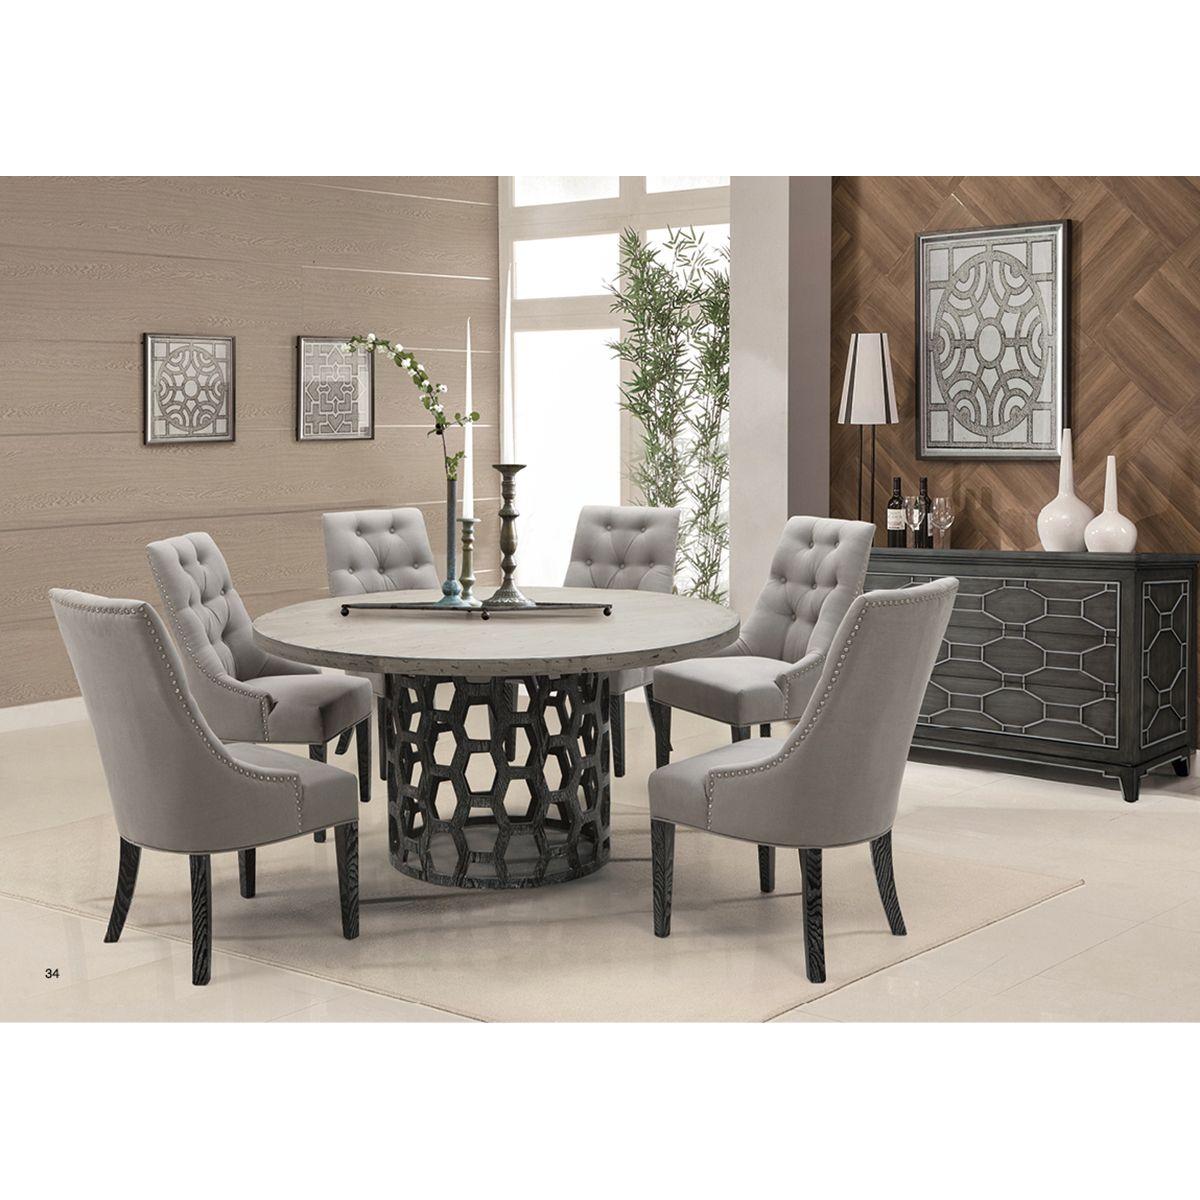 Comedor salas mesas de comedor modernas decoraci n de for Mesa de comedor elegante lamentable